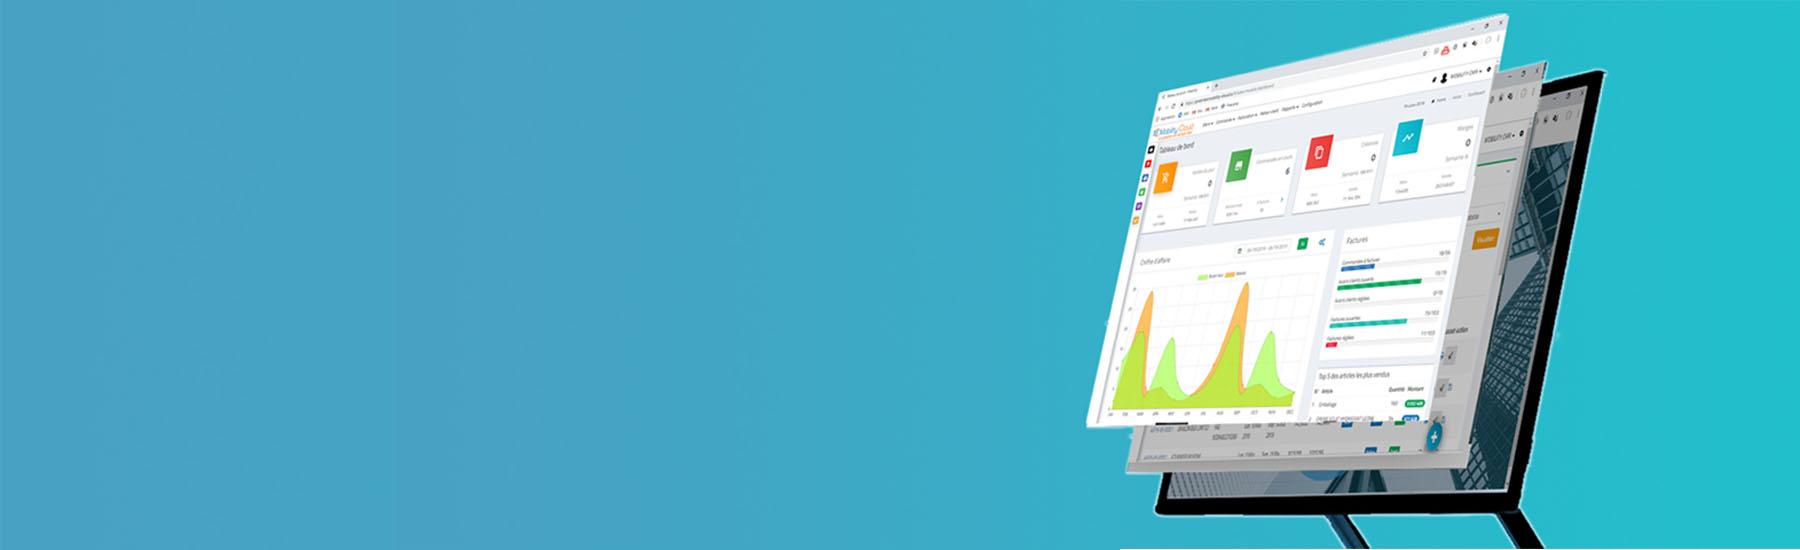 Dashboard logiciel gestion commercial